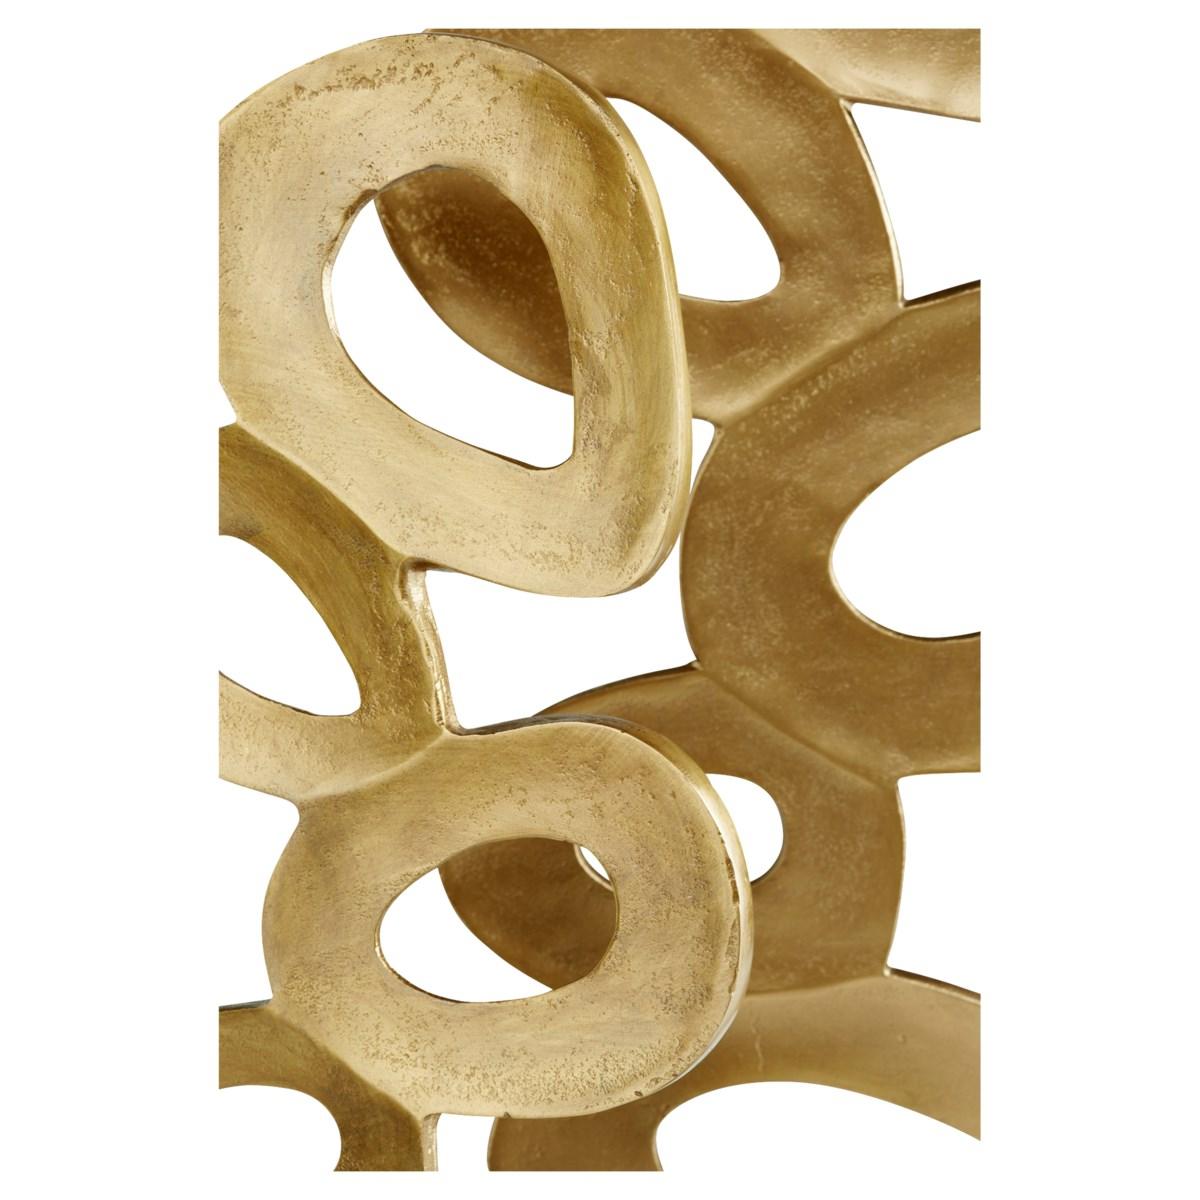 Chellean Lux #1 Sculpture